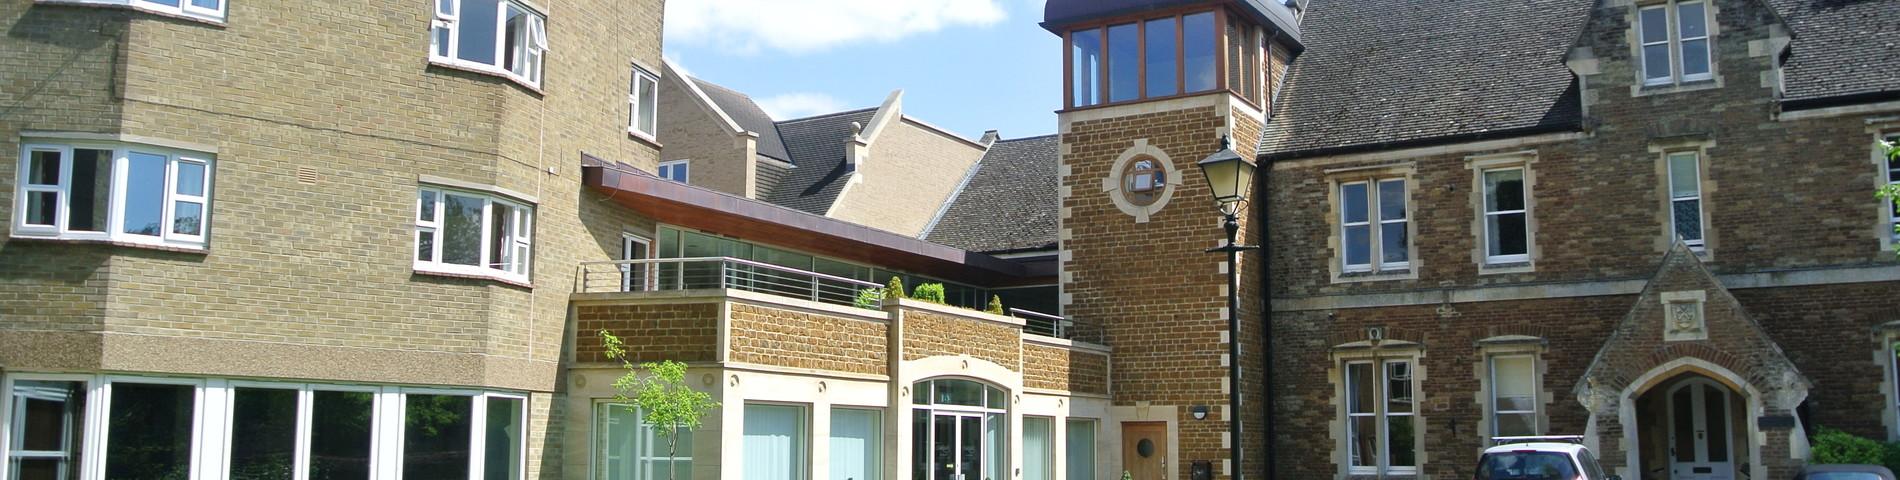 Stafford House International Junior Centre รูปภาพ 1